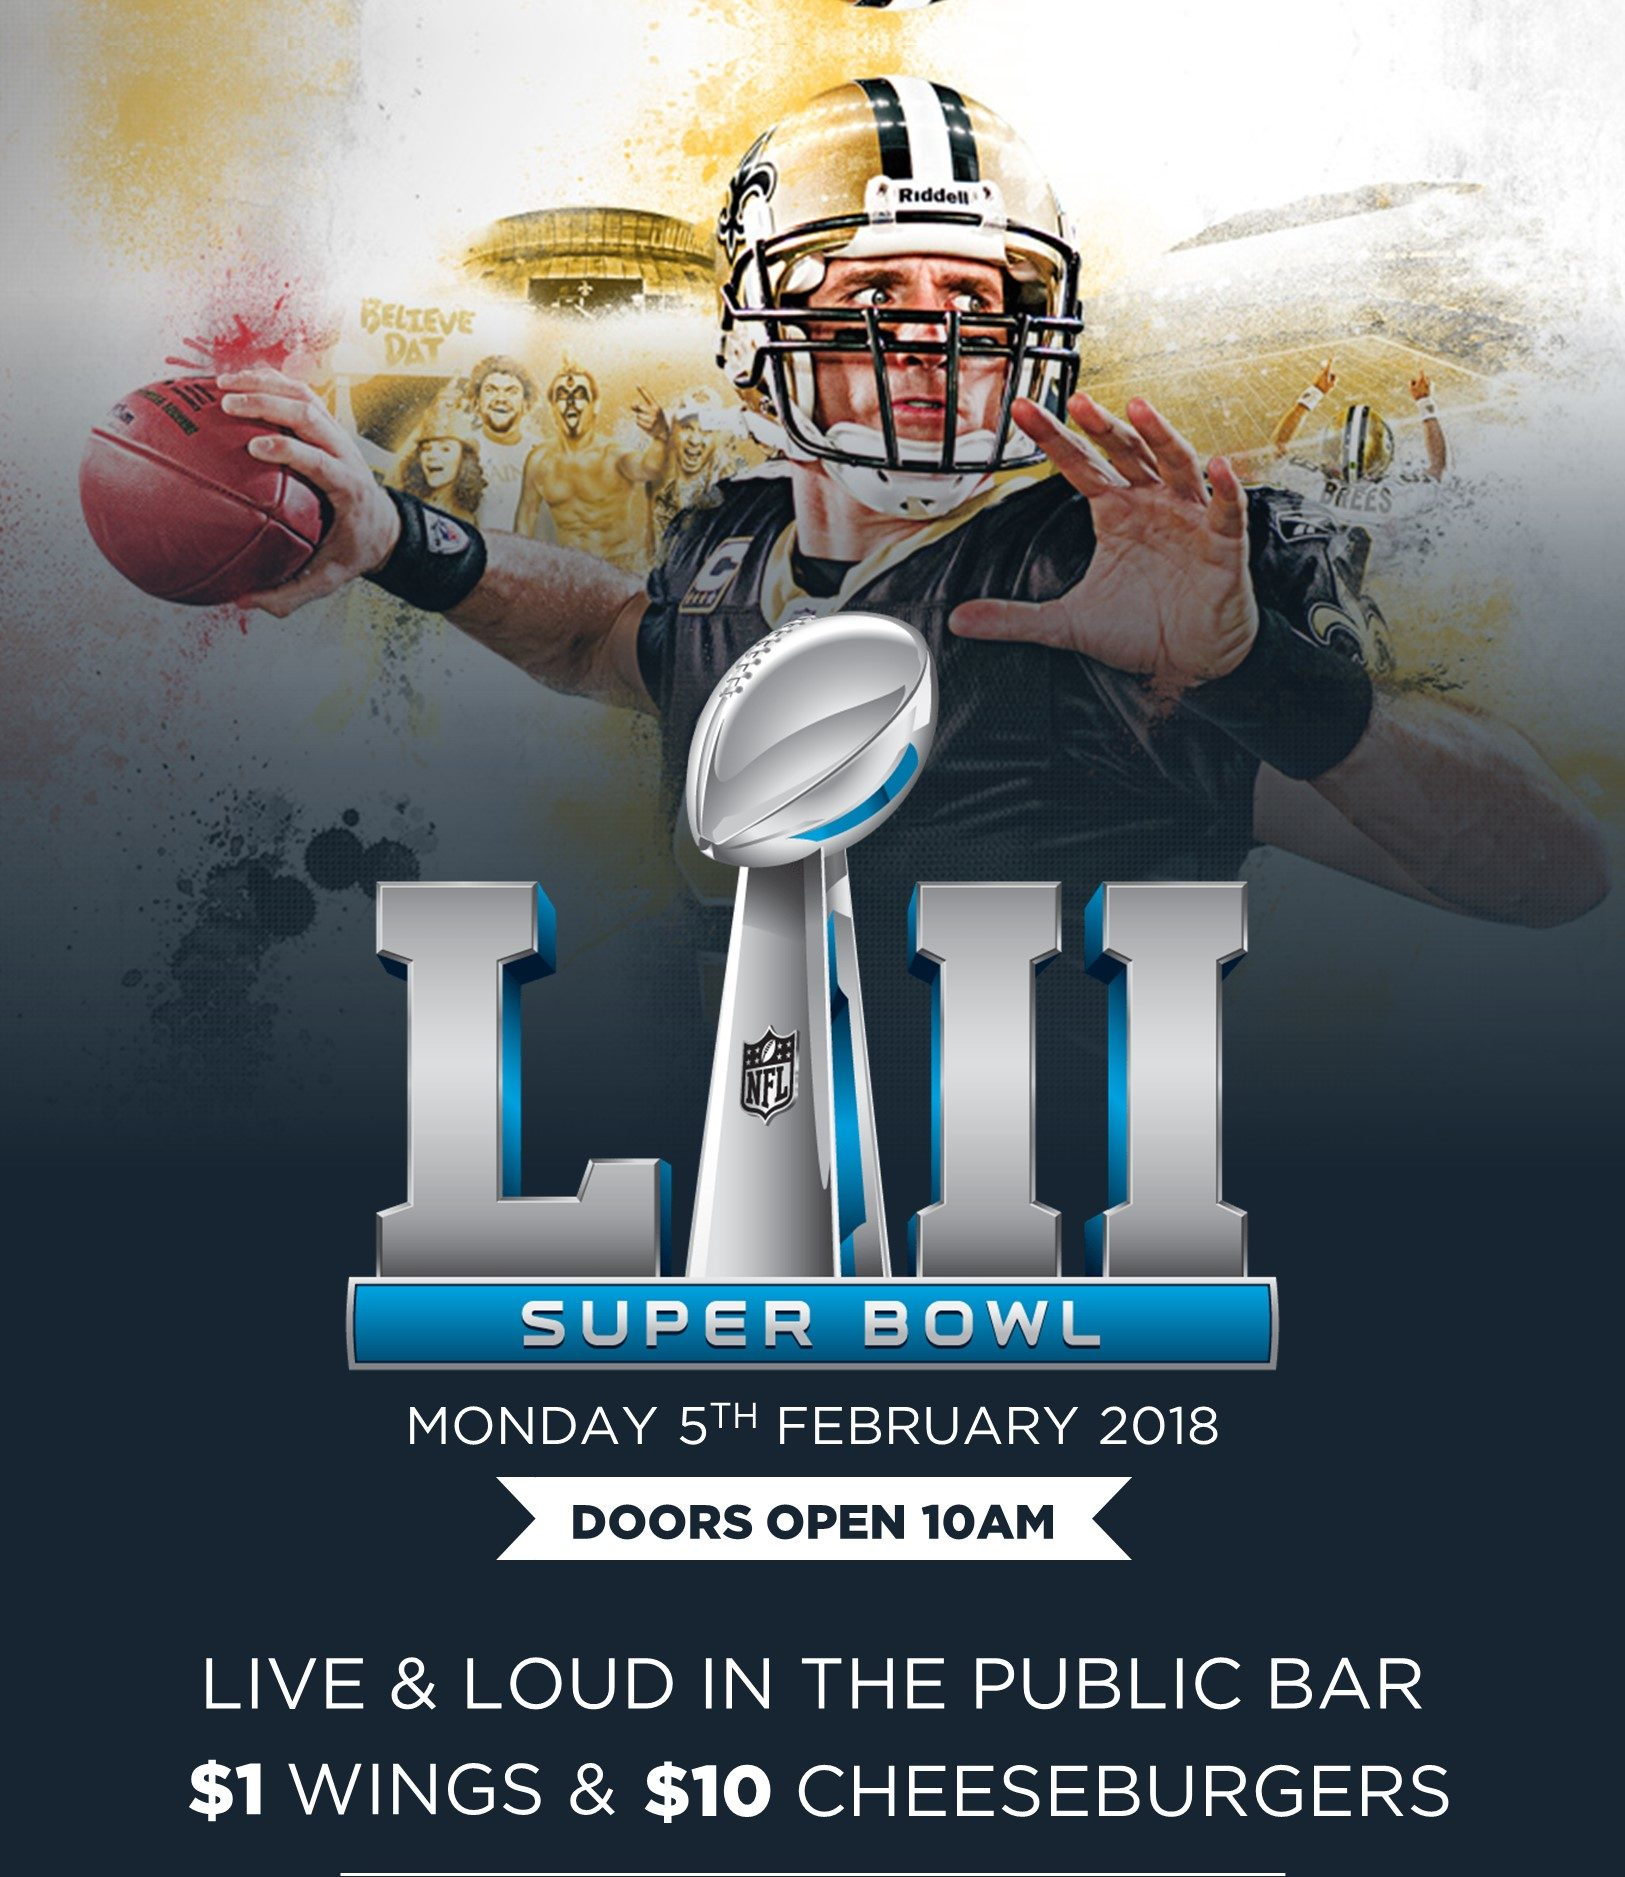 Super bowl Sydney pub watch live game bar nfl